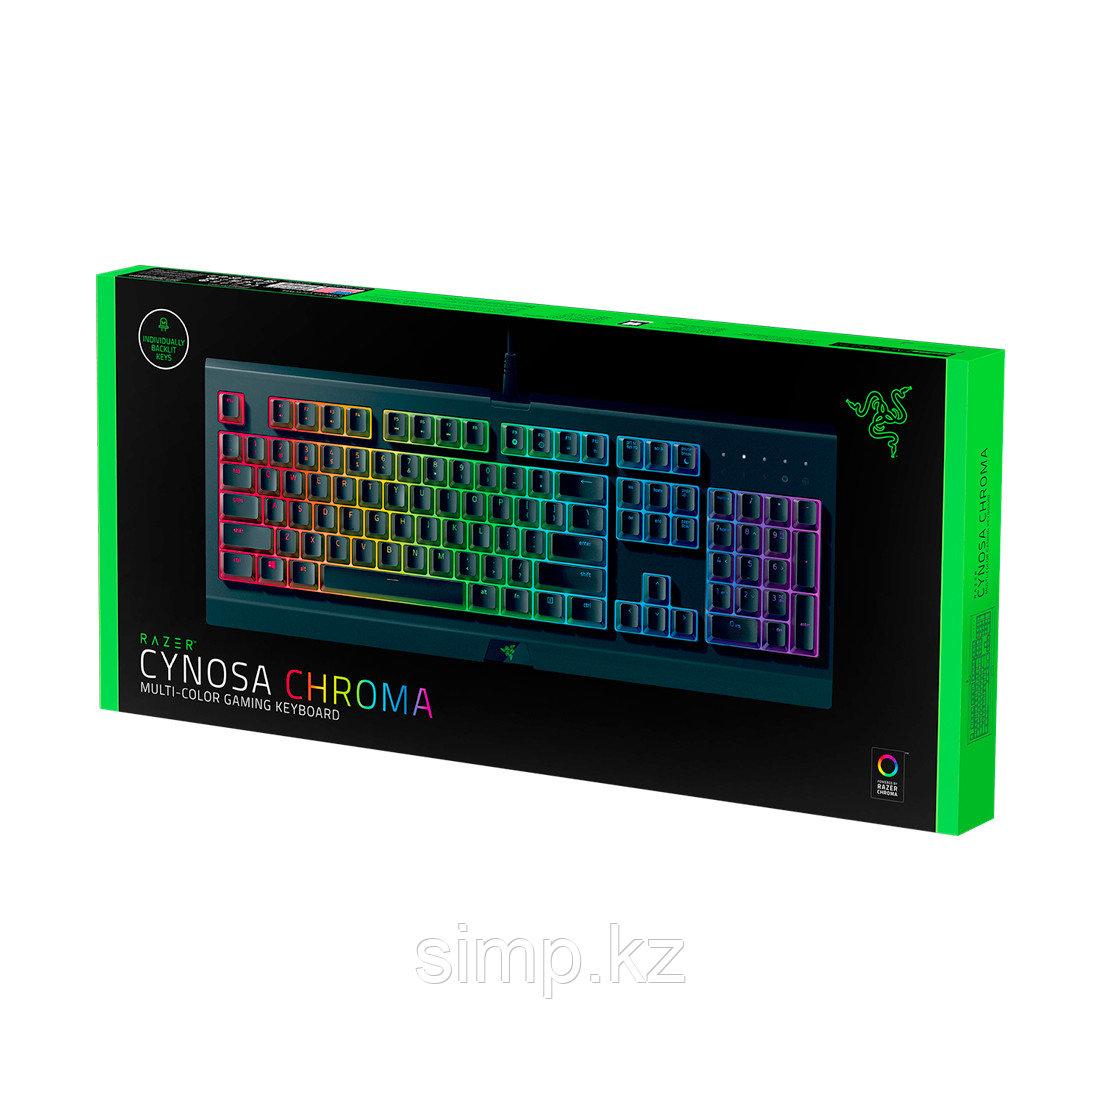 Клавиатура Razer Cynosa Chroma